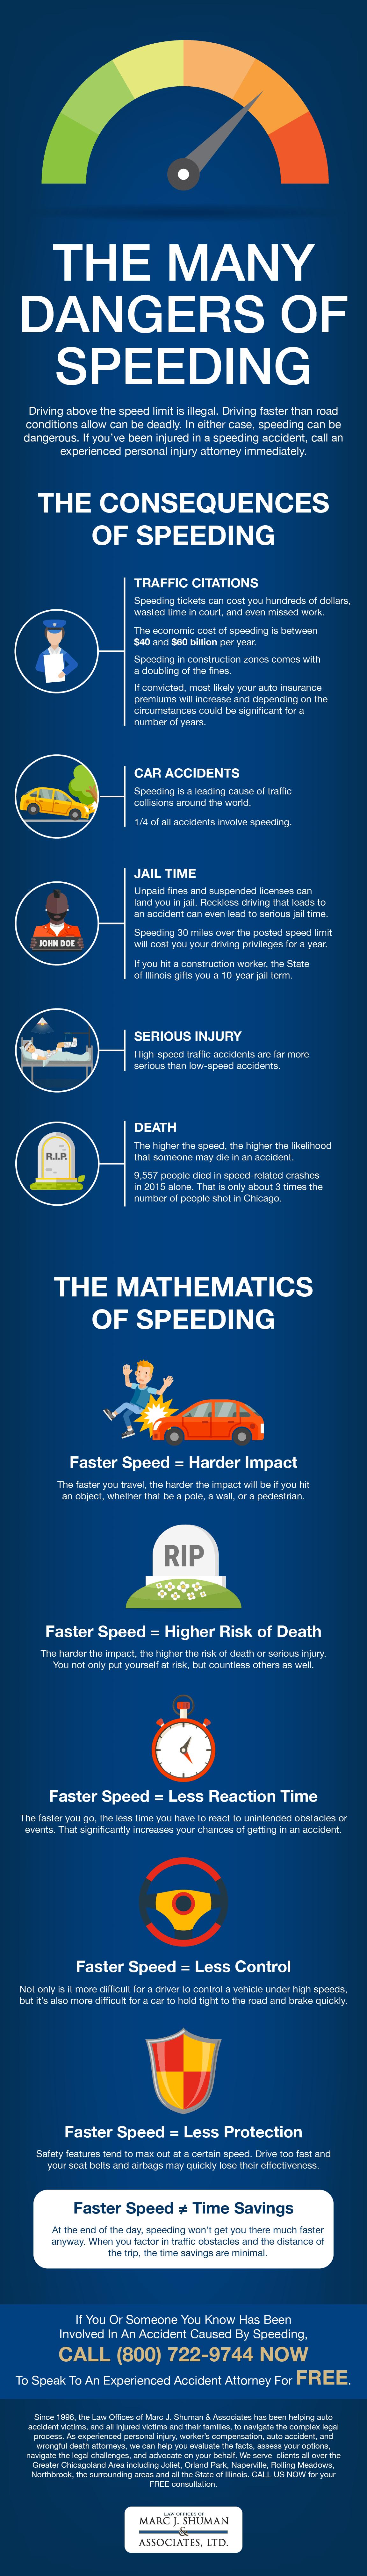 dangers of speeding